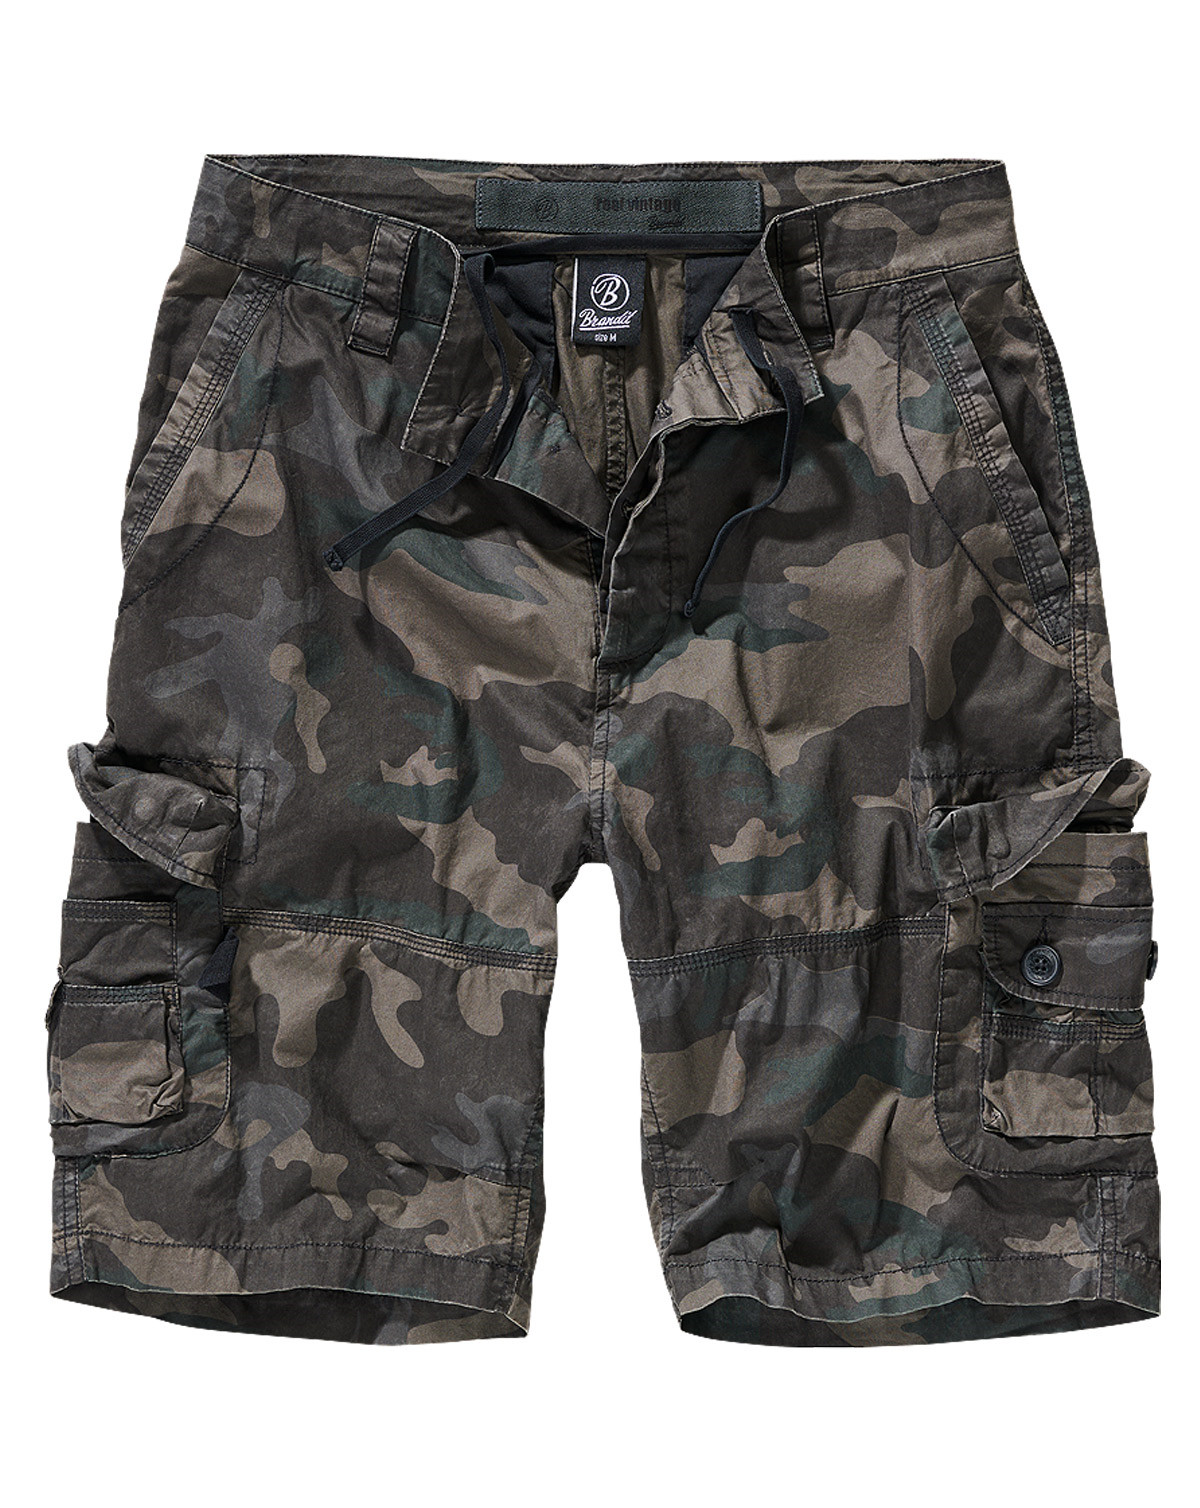 Brandit Ty Shorts (Dark Camo, XL)